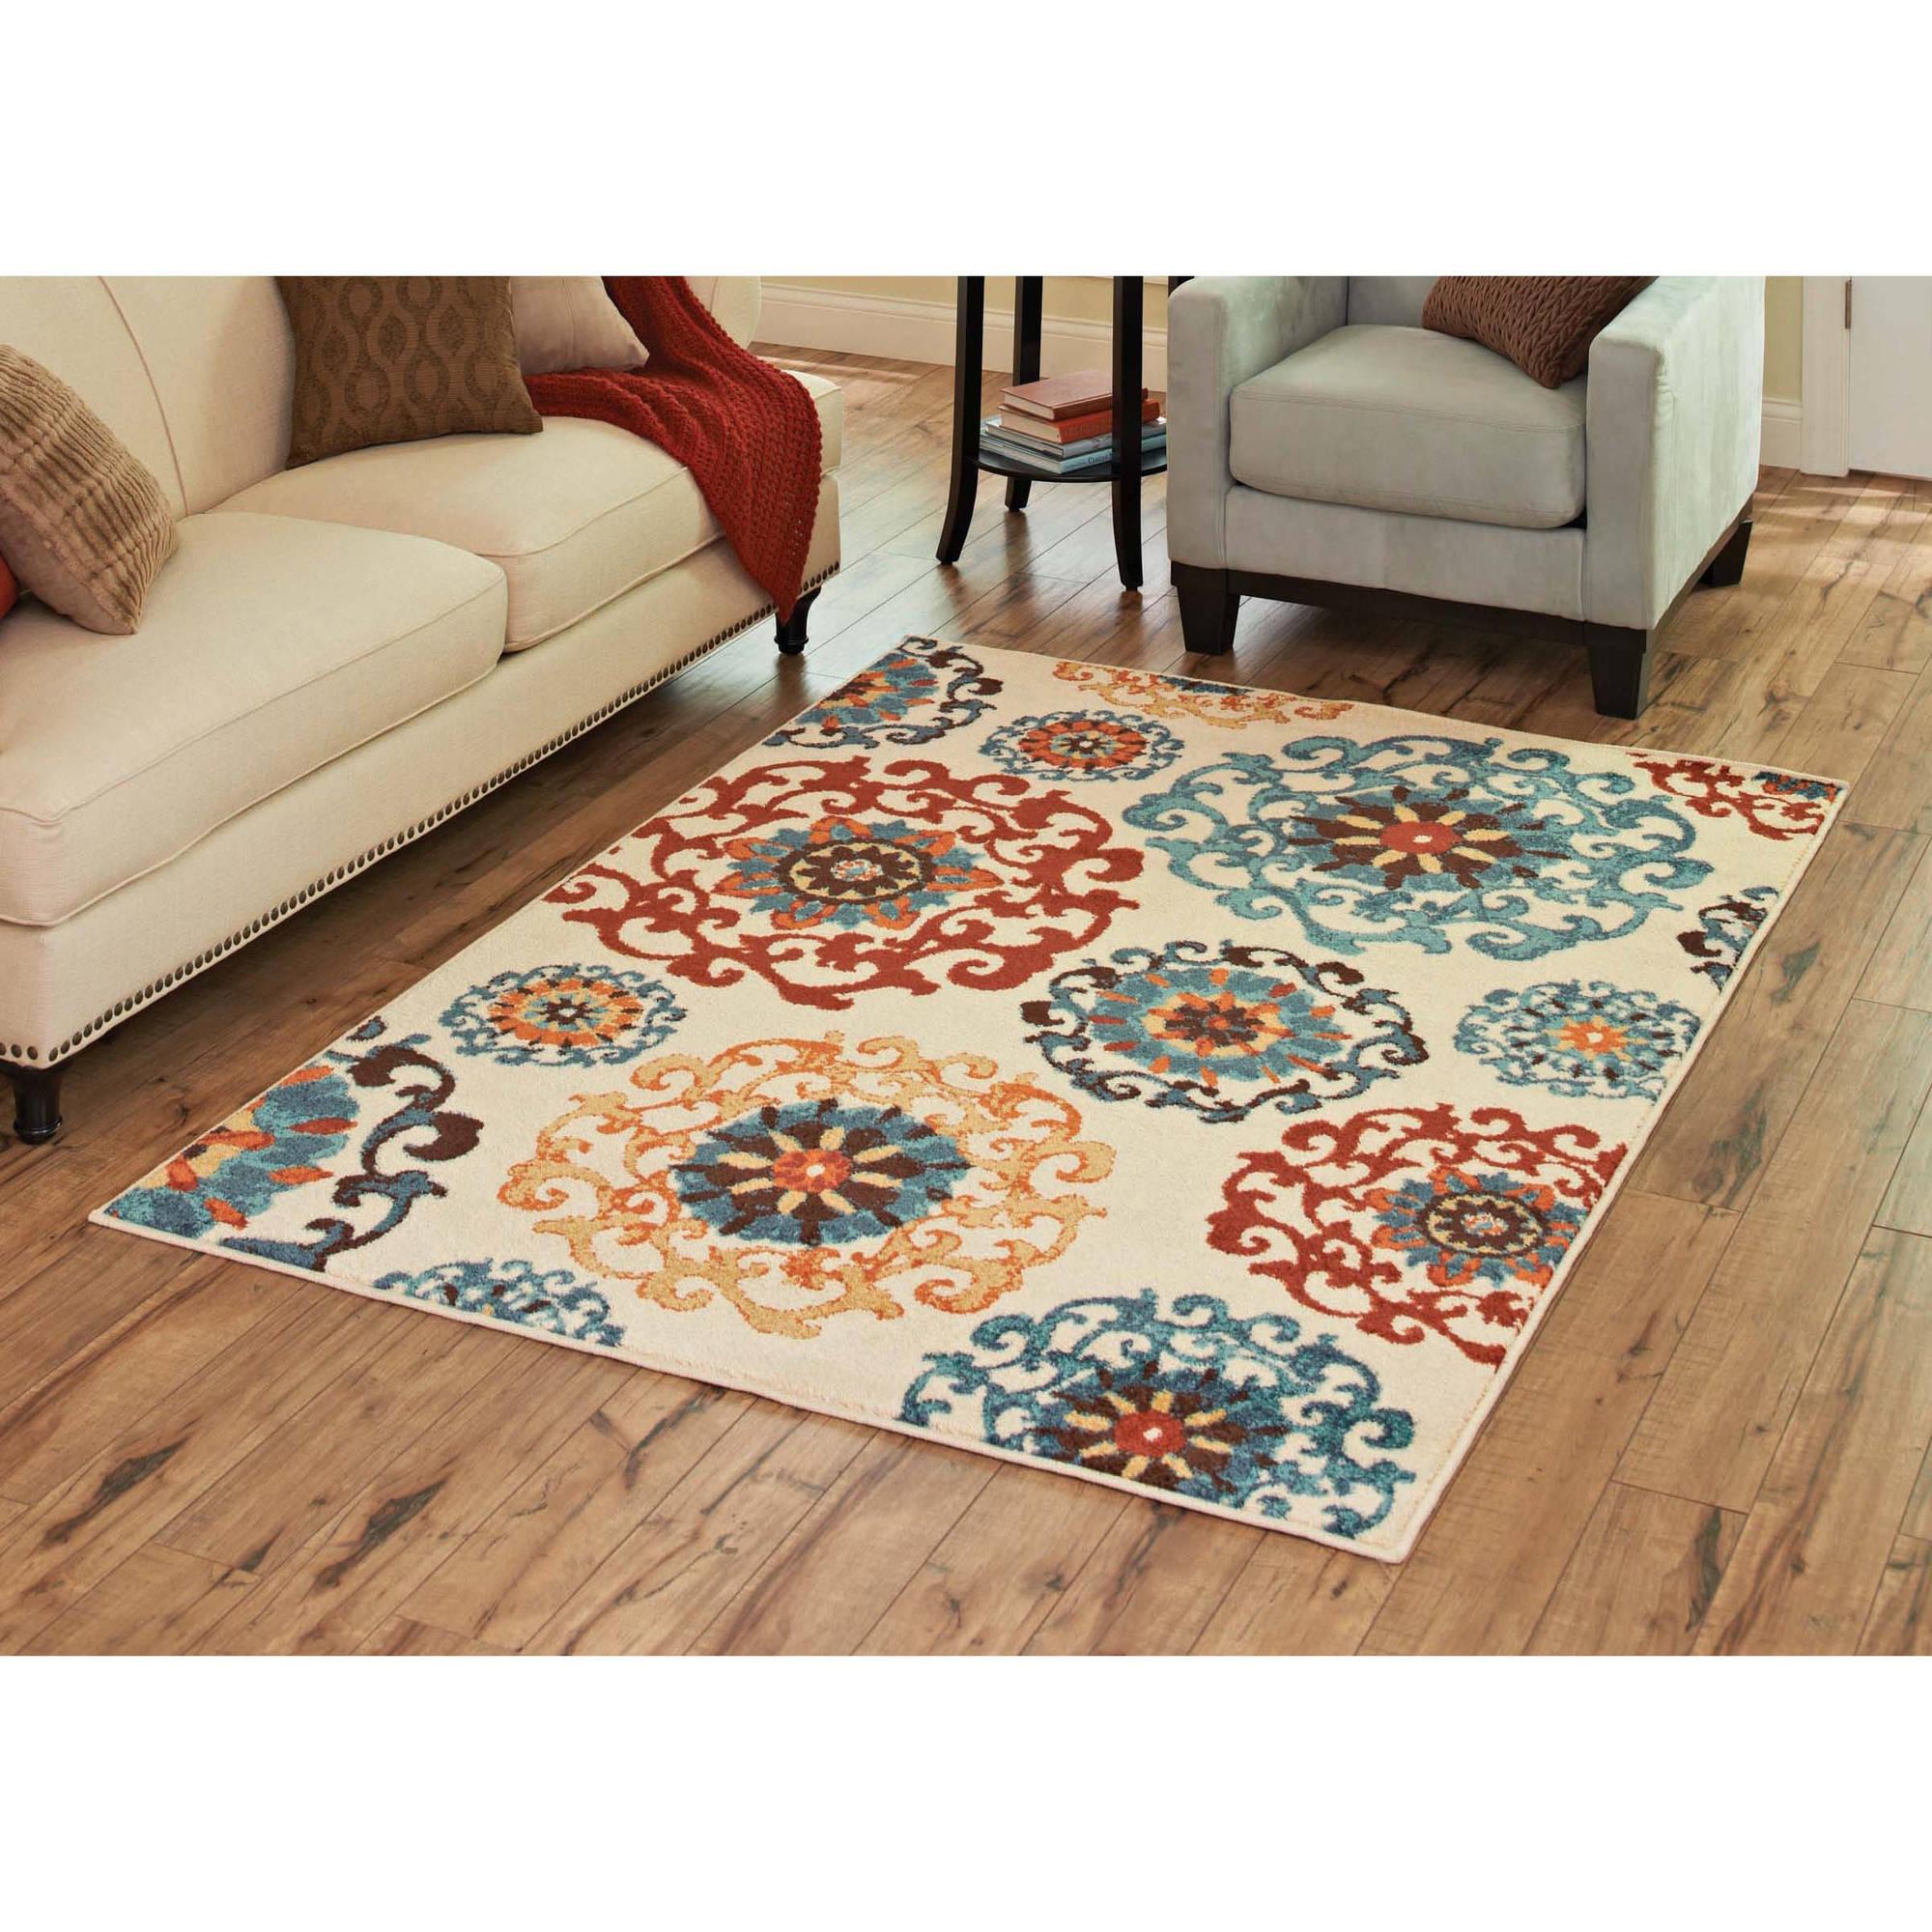 better homes and gardens suzani area rug or runner KZQOJST